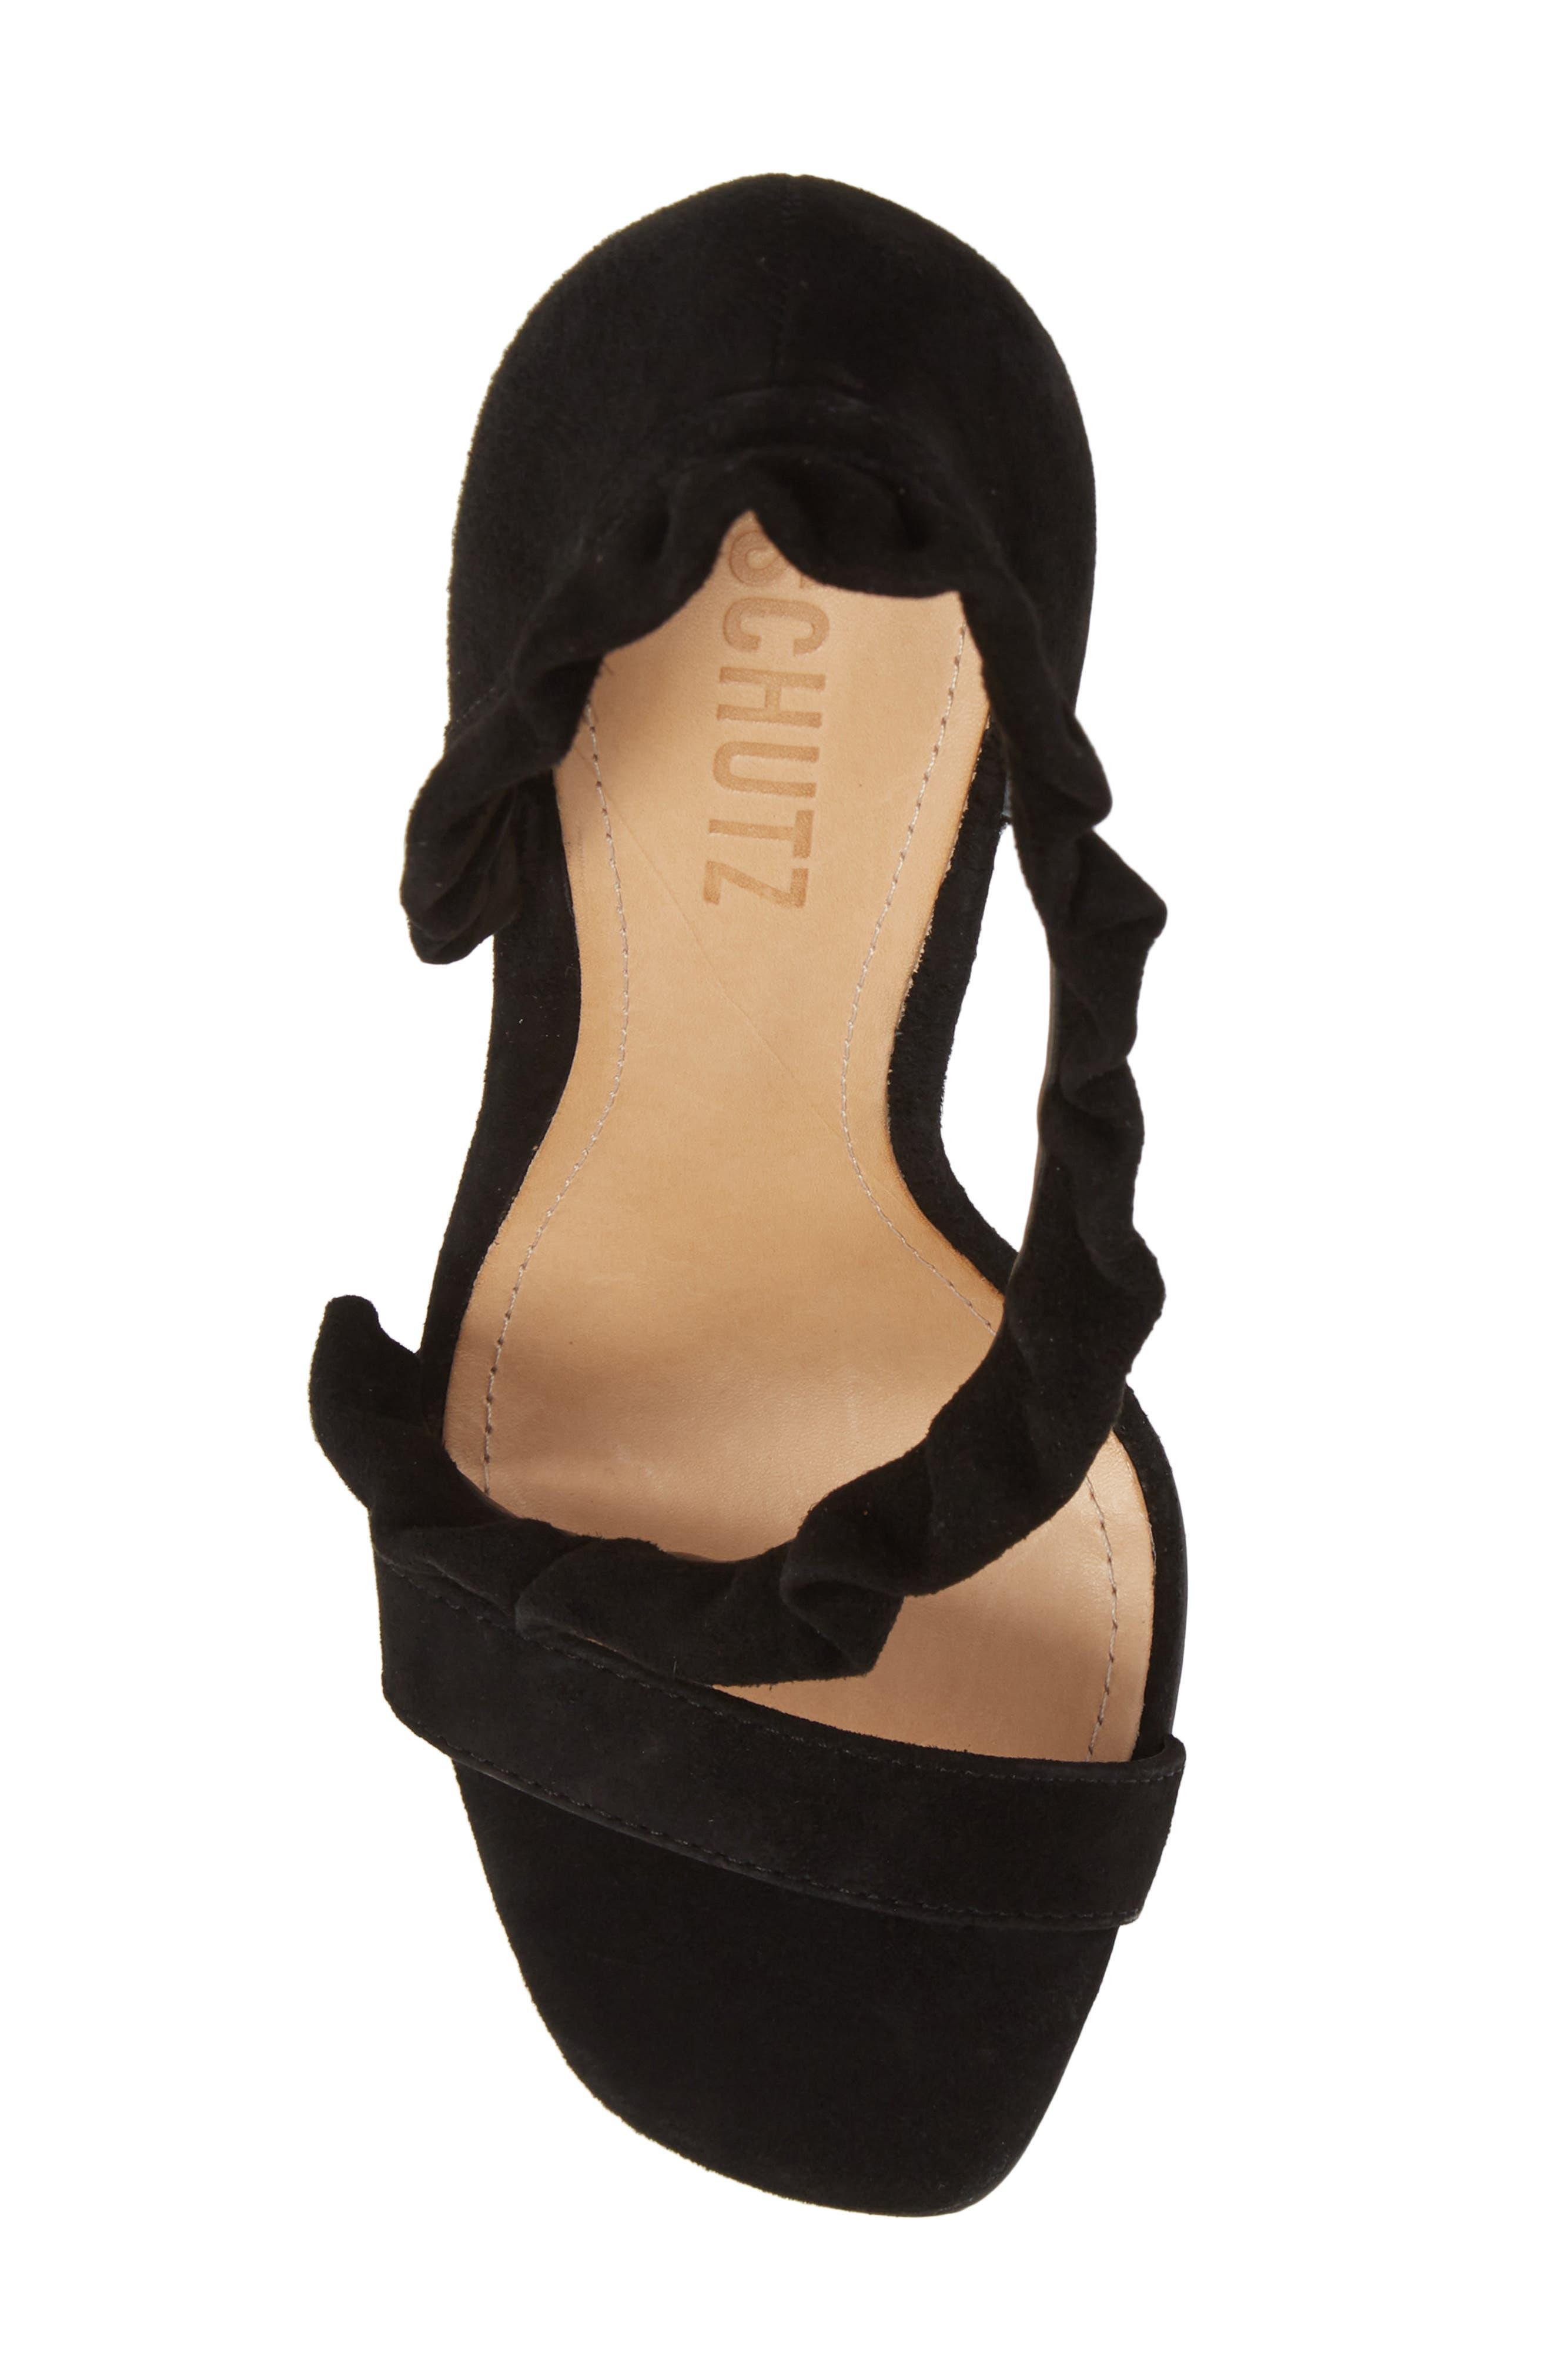 Aim Ruffle Sandal,                             Alternate thumbnail 5, color,                             BLACK SUEDE